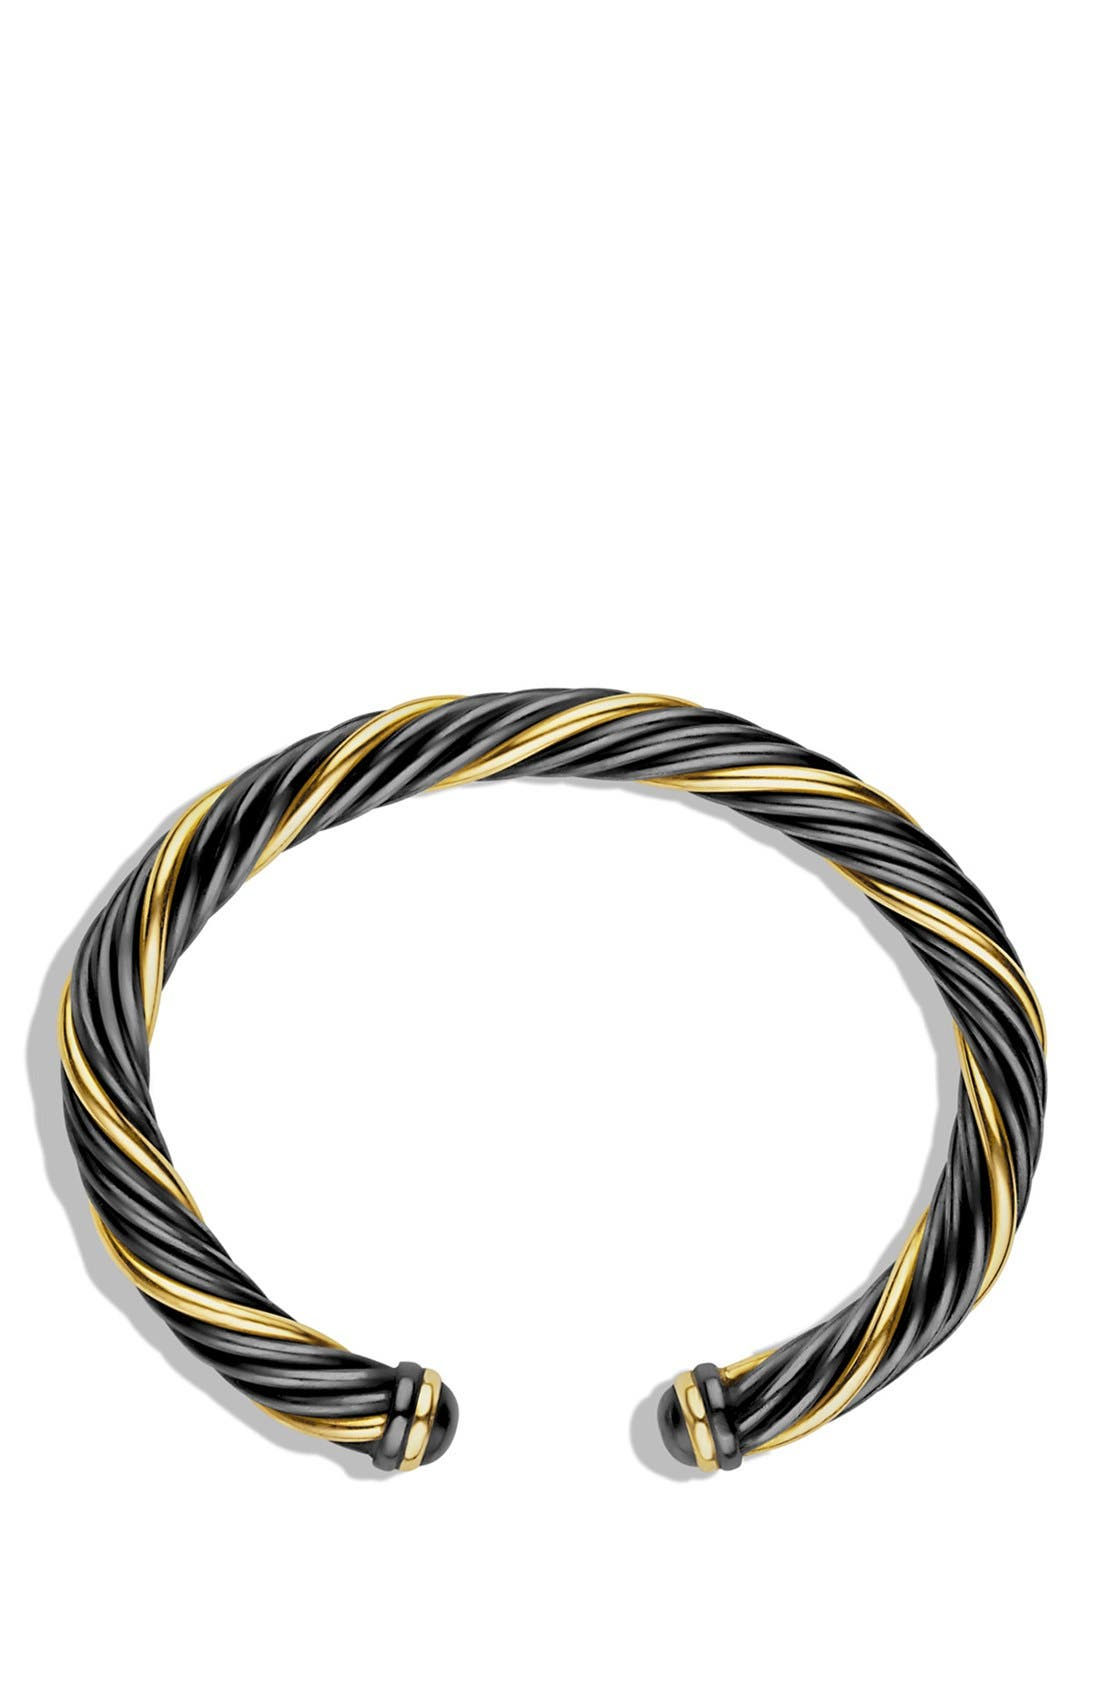 Alternate Image 2  - David Yurman 'Black and Gold' Cable Bracelet